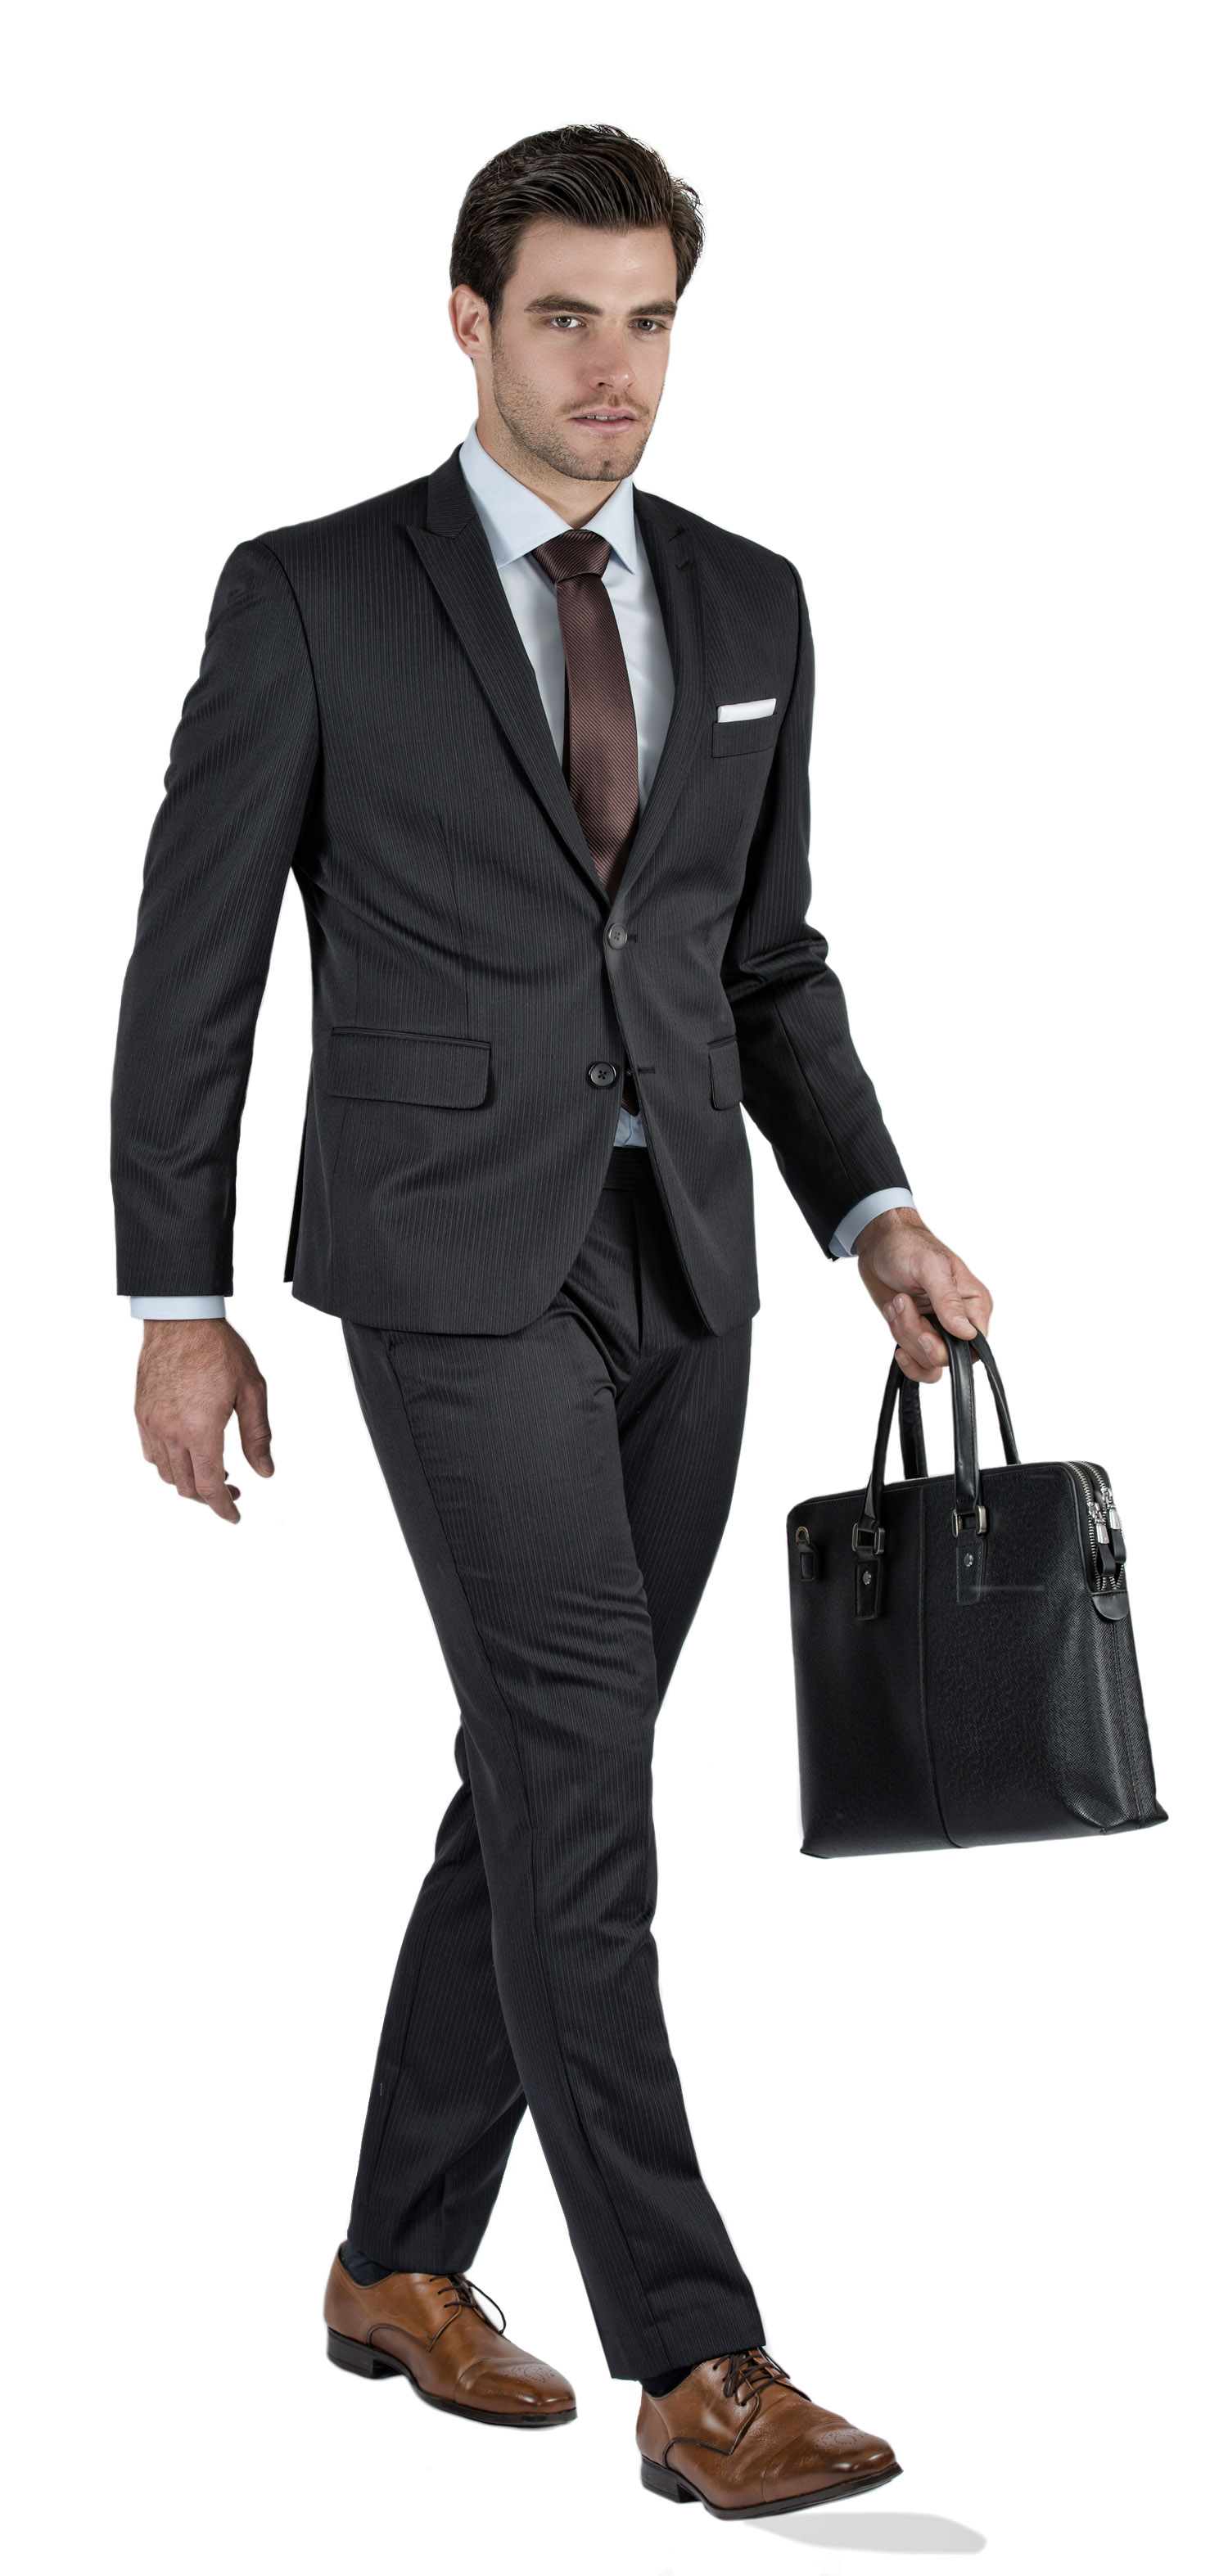 traje gris traje gris marengo marengo zapatos 4Sq81 7db1223dd71